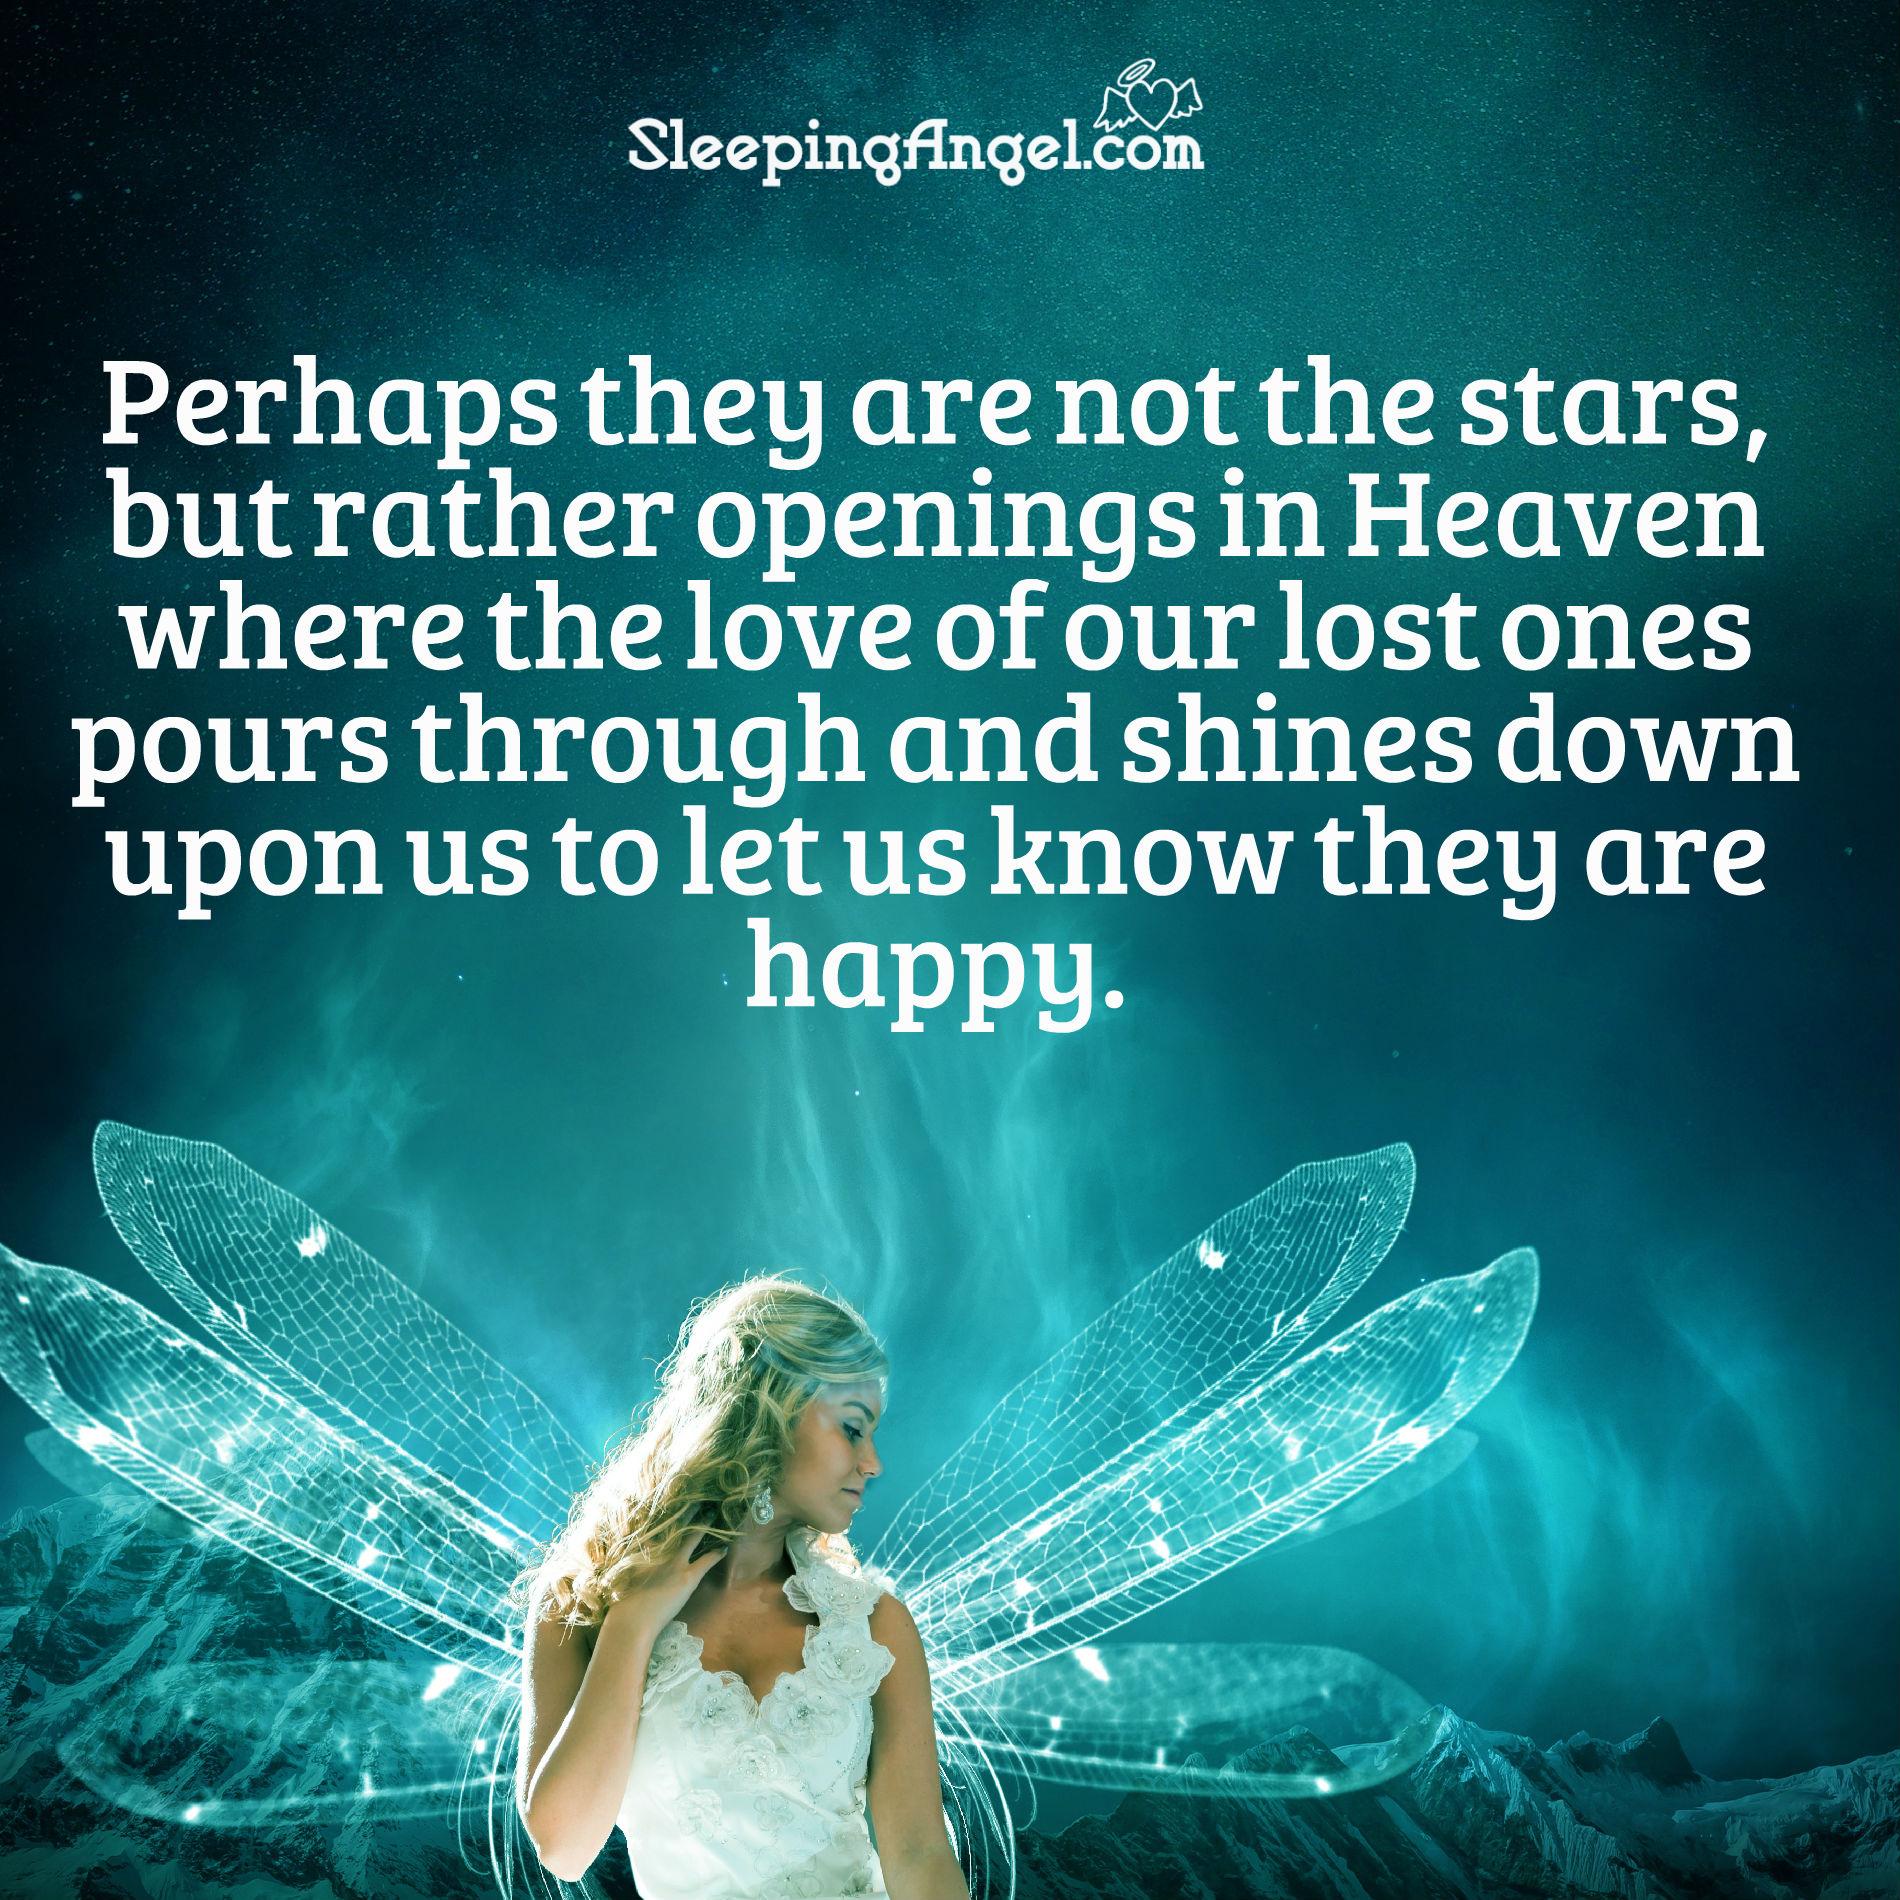 Openings in Heaven Quote